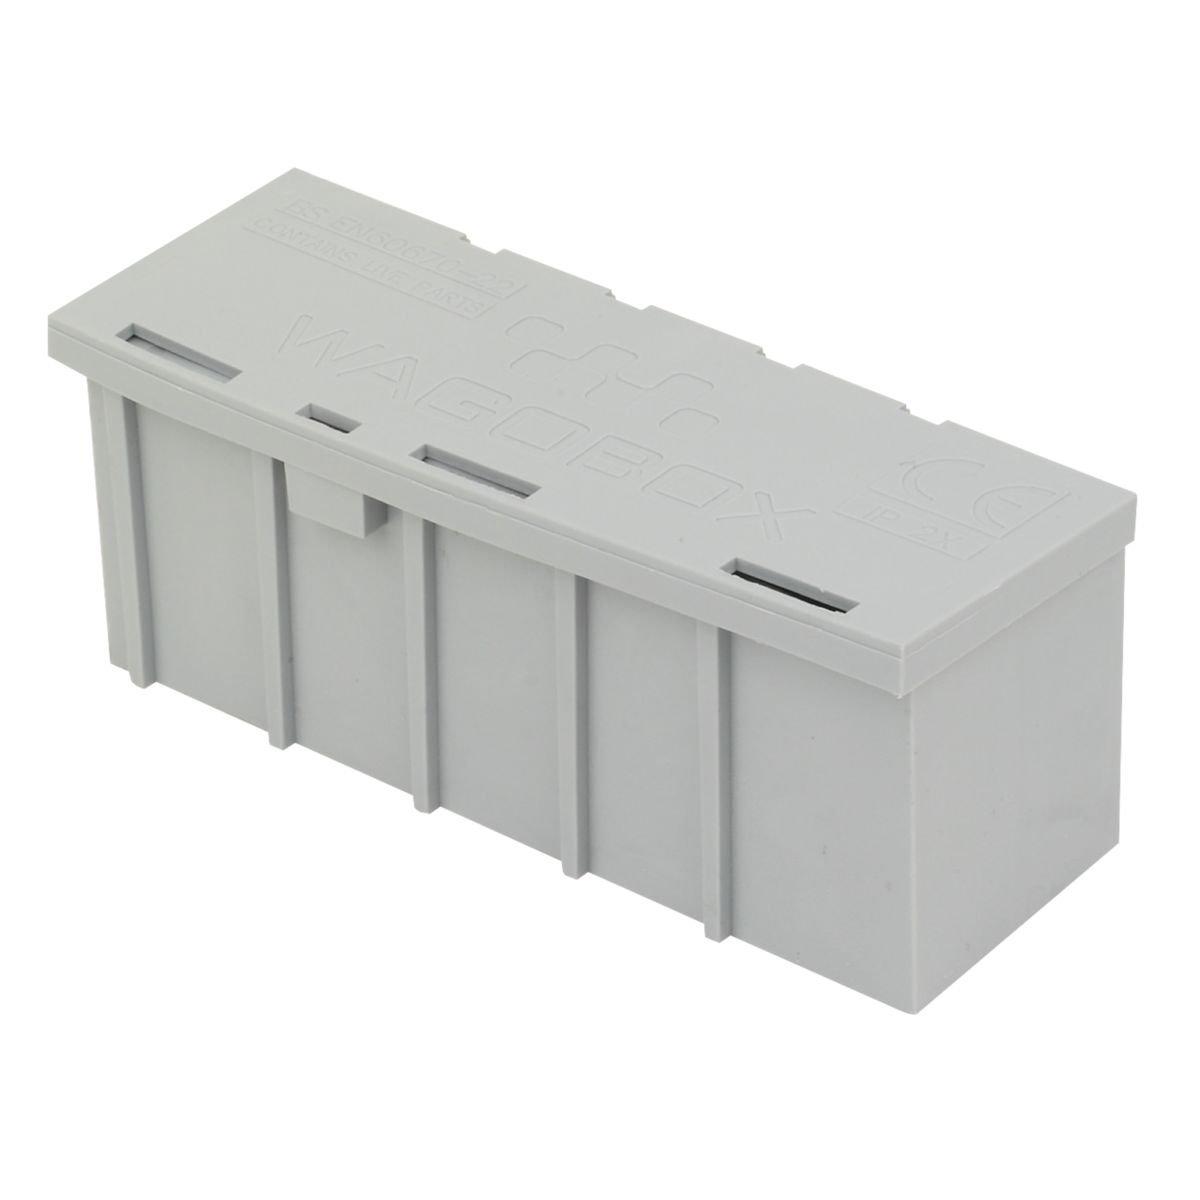 Wagobox Junction Box Pack of 10